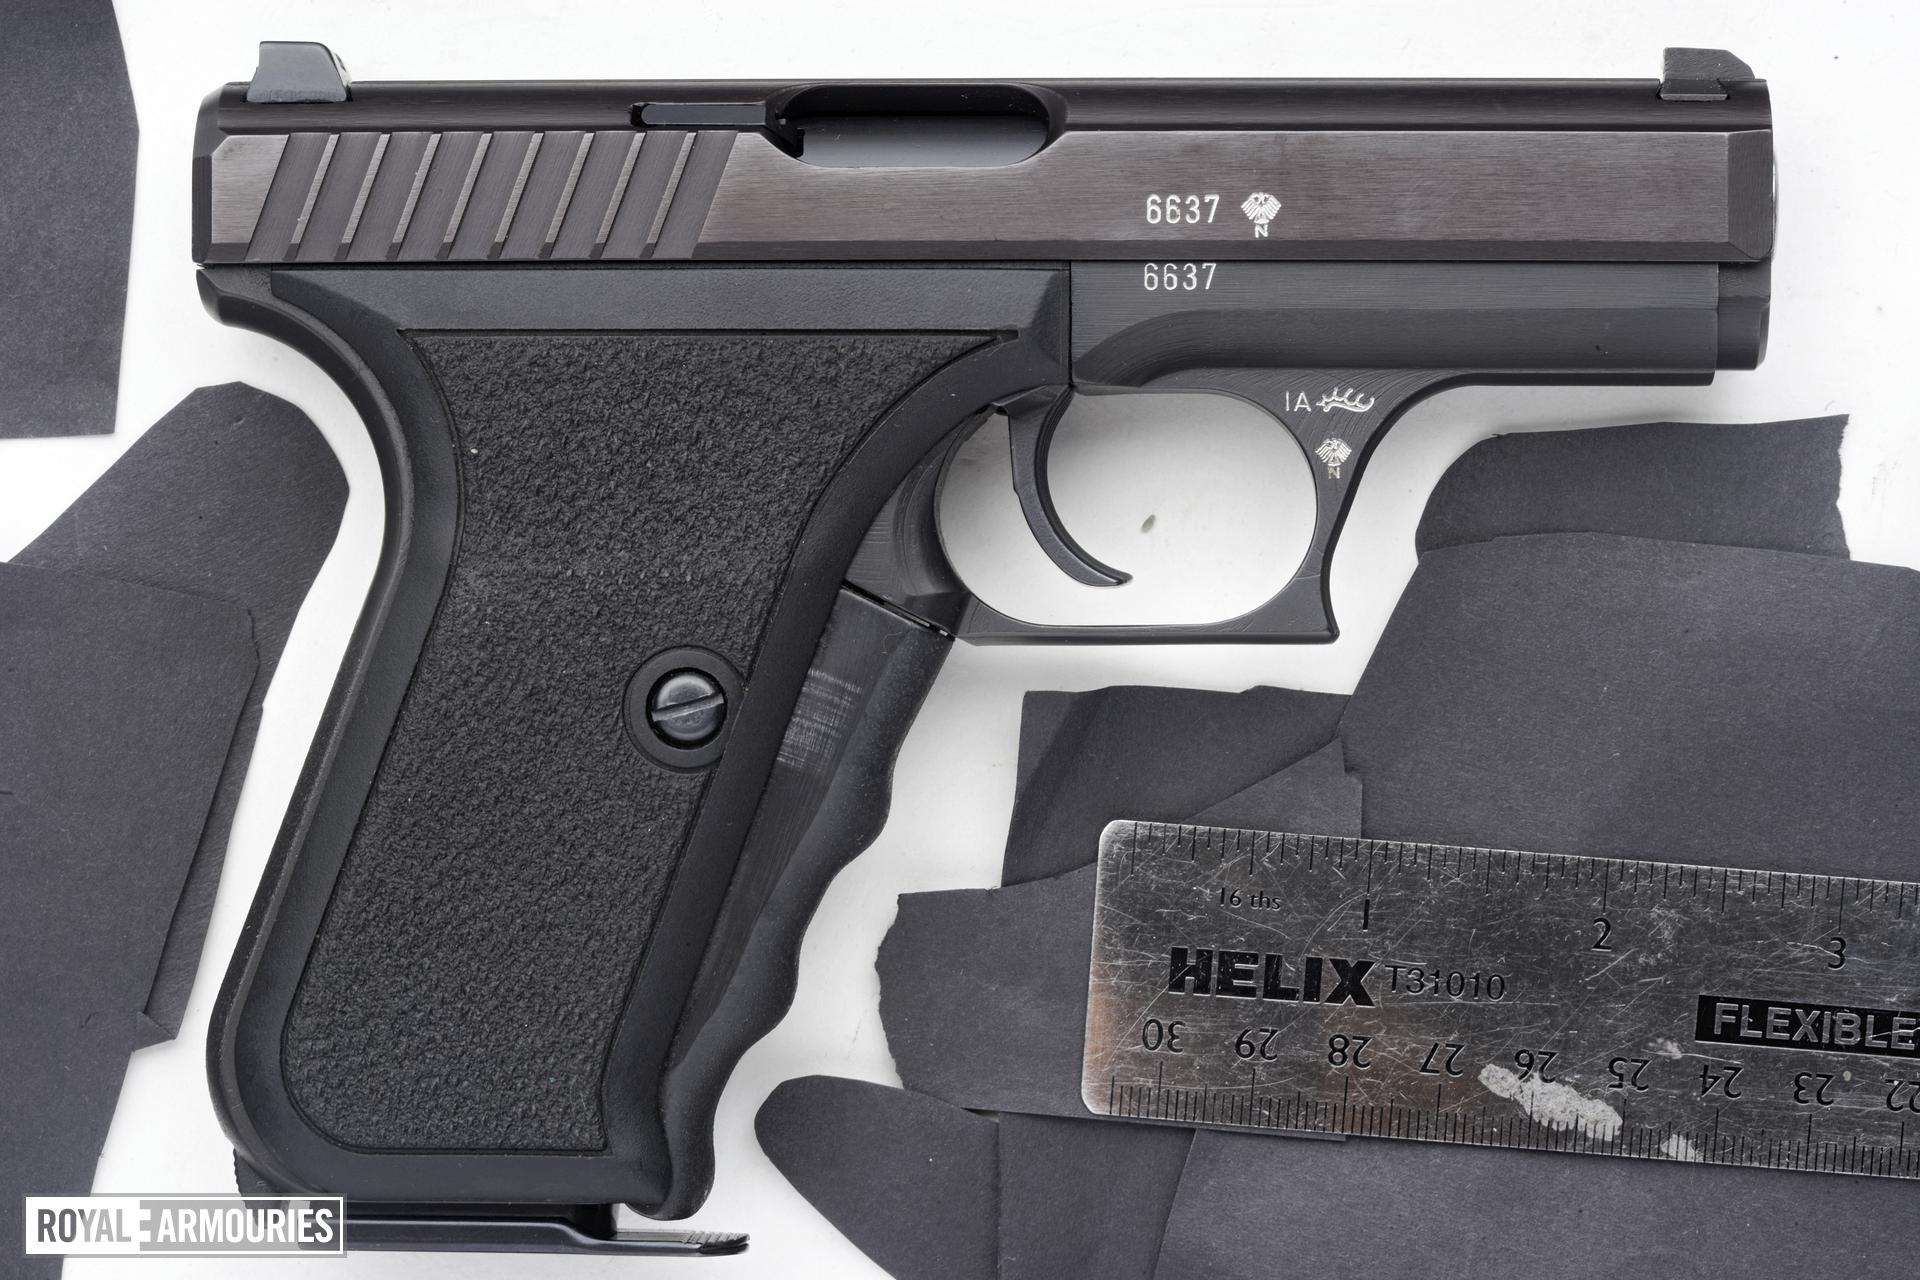 Centrefire self-loading pistol - Heckler and Koch P7